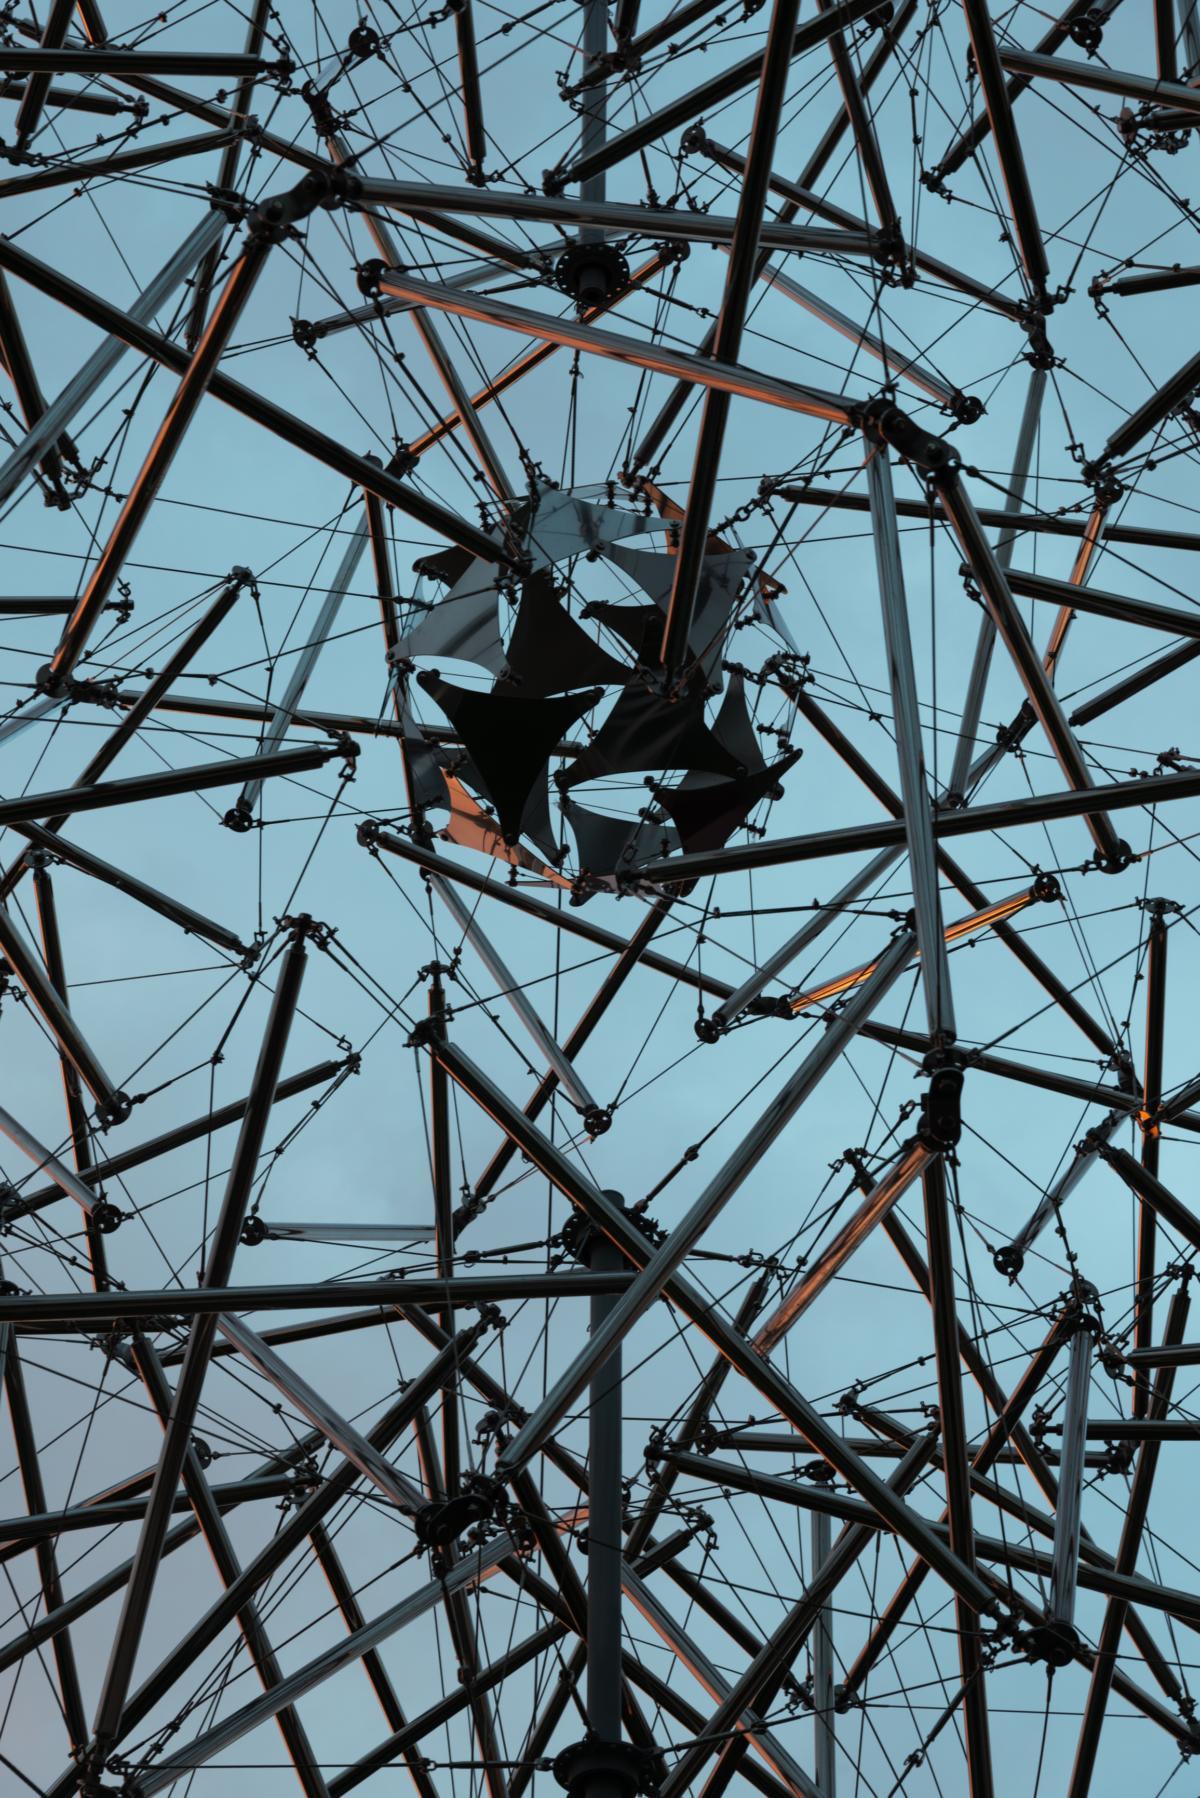 'Atom' (1967/2018) by Viacheslav Koleichuk at Garage Museum of Contemporary Art